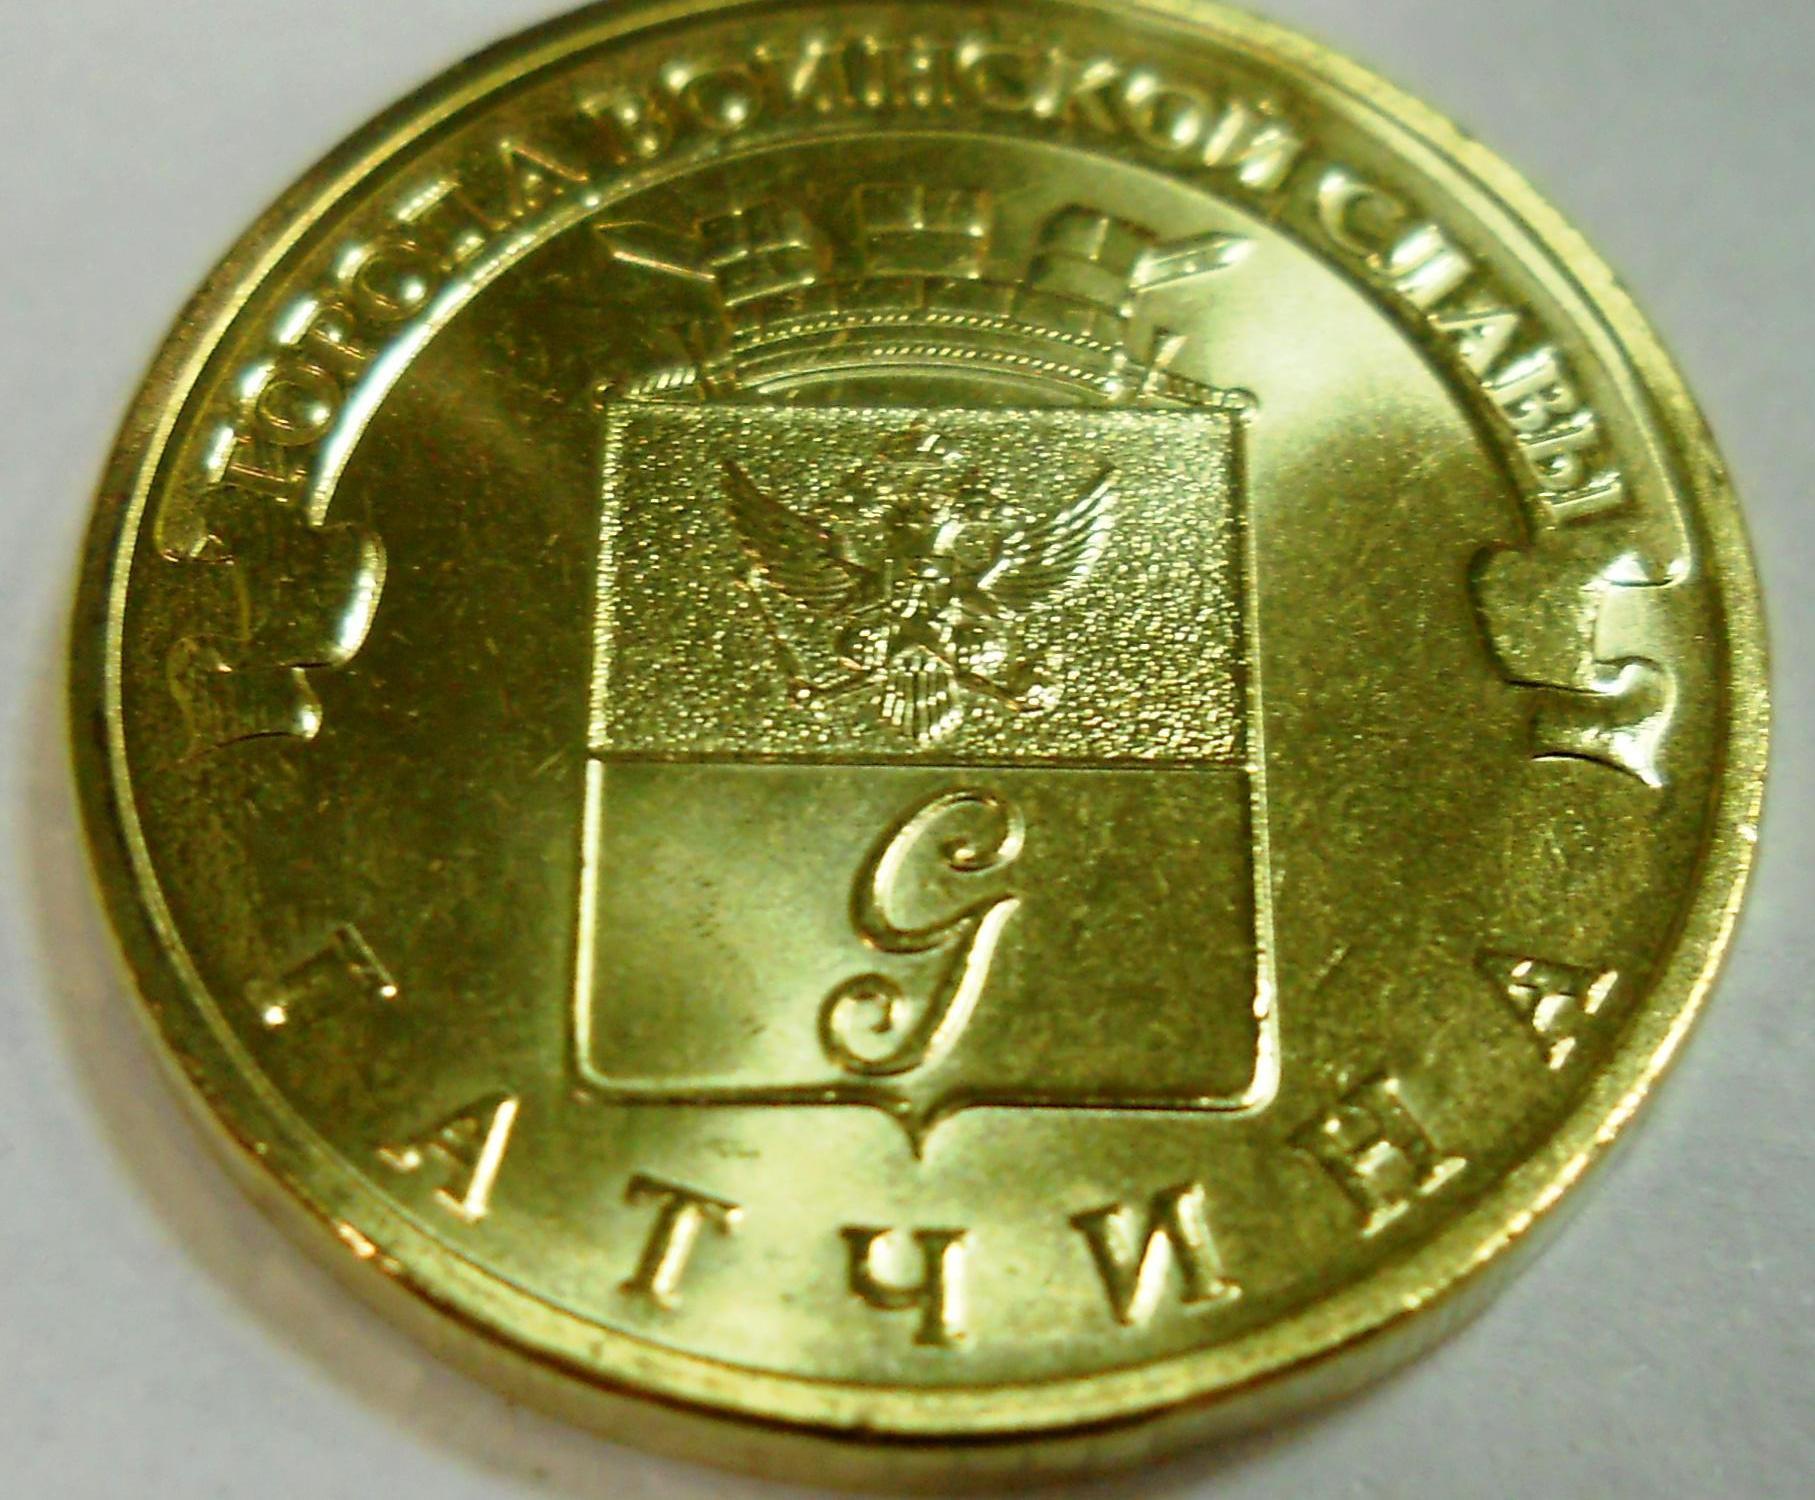 10 рублей Гатчина 2016 г. UNC